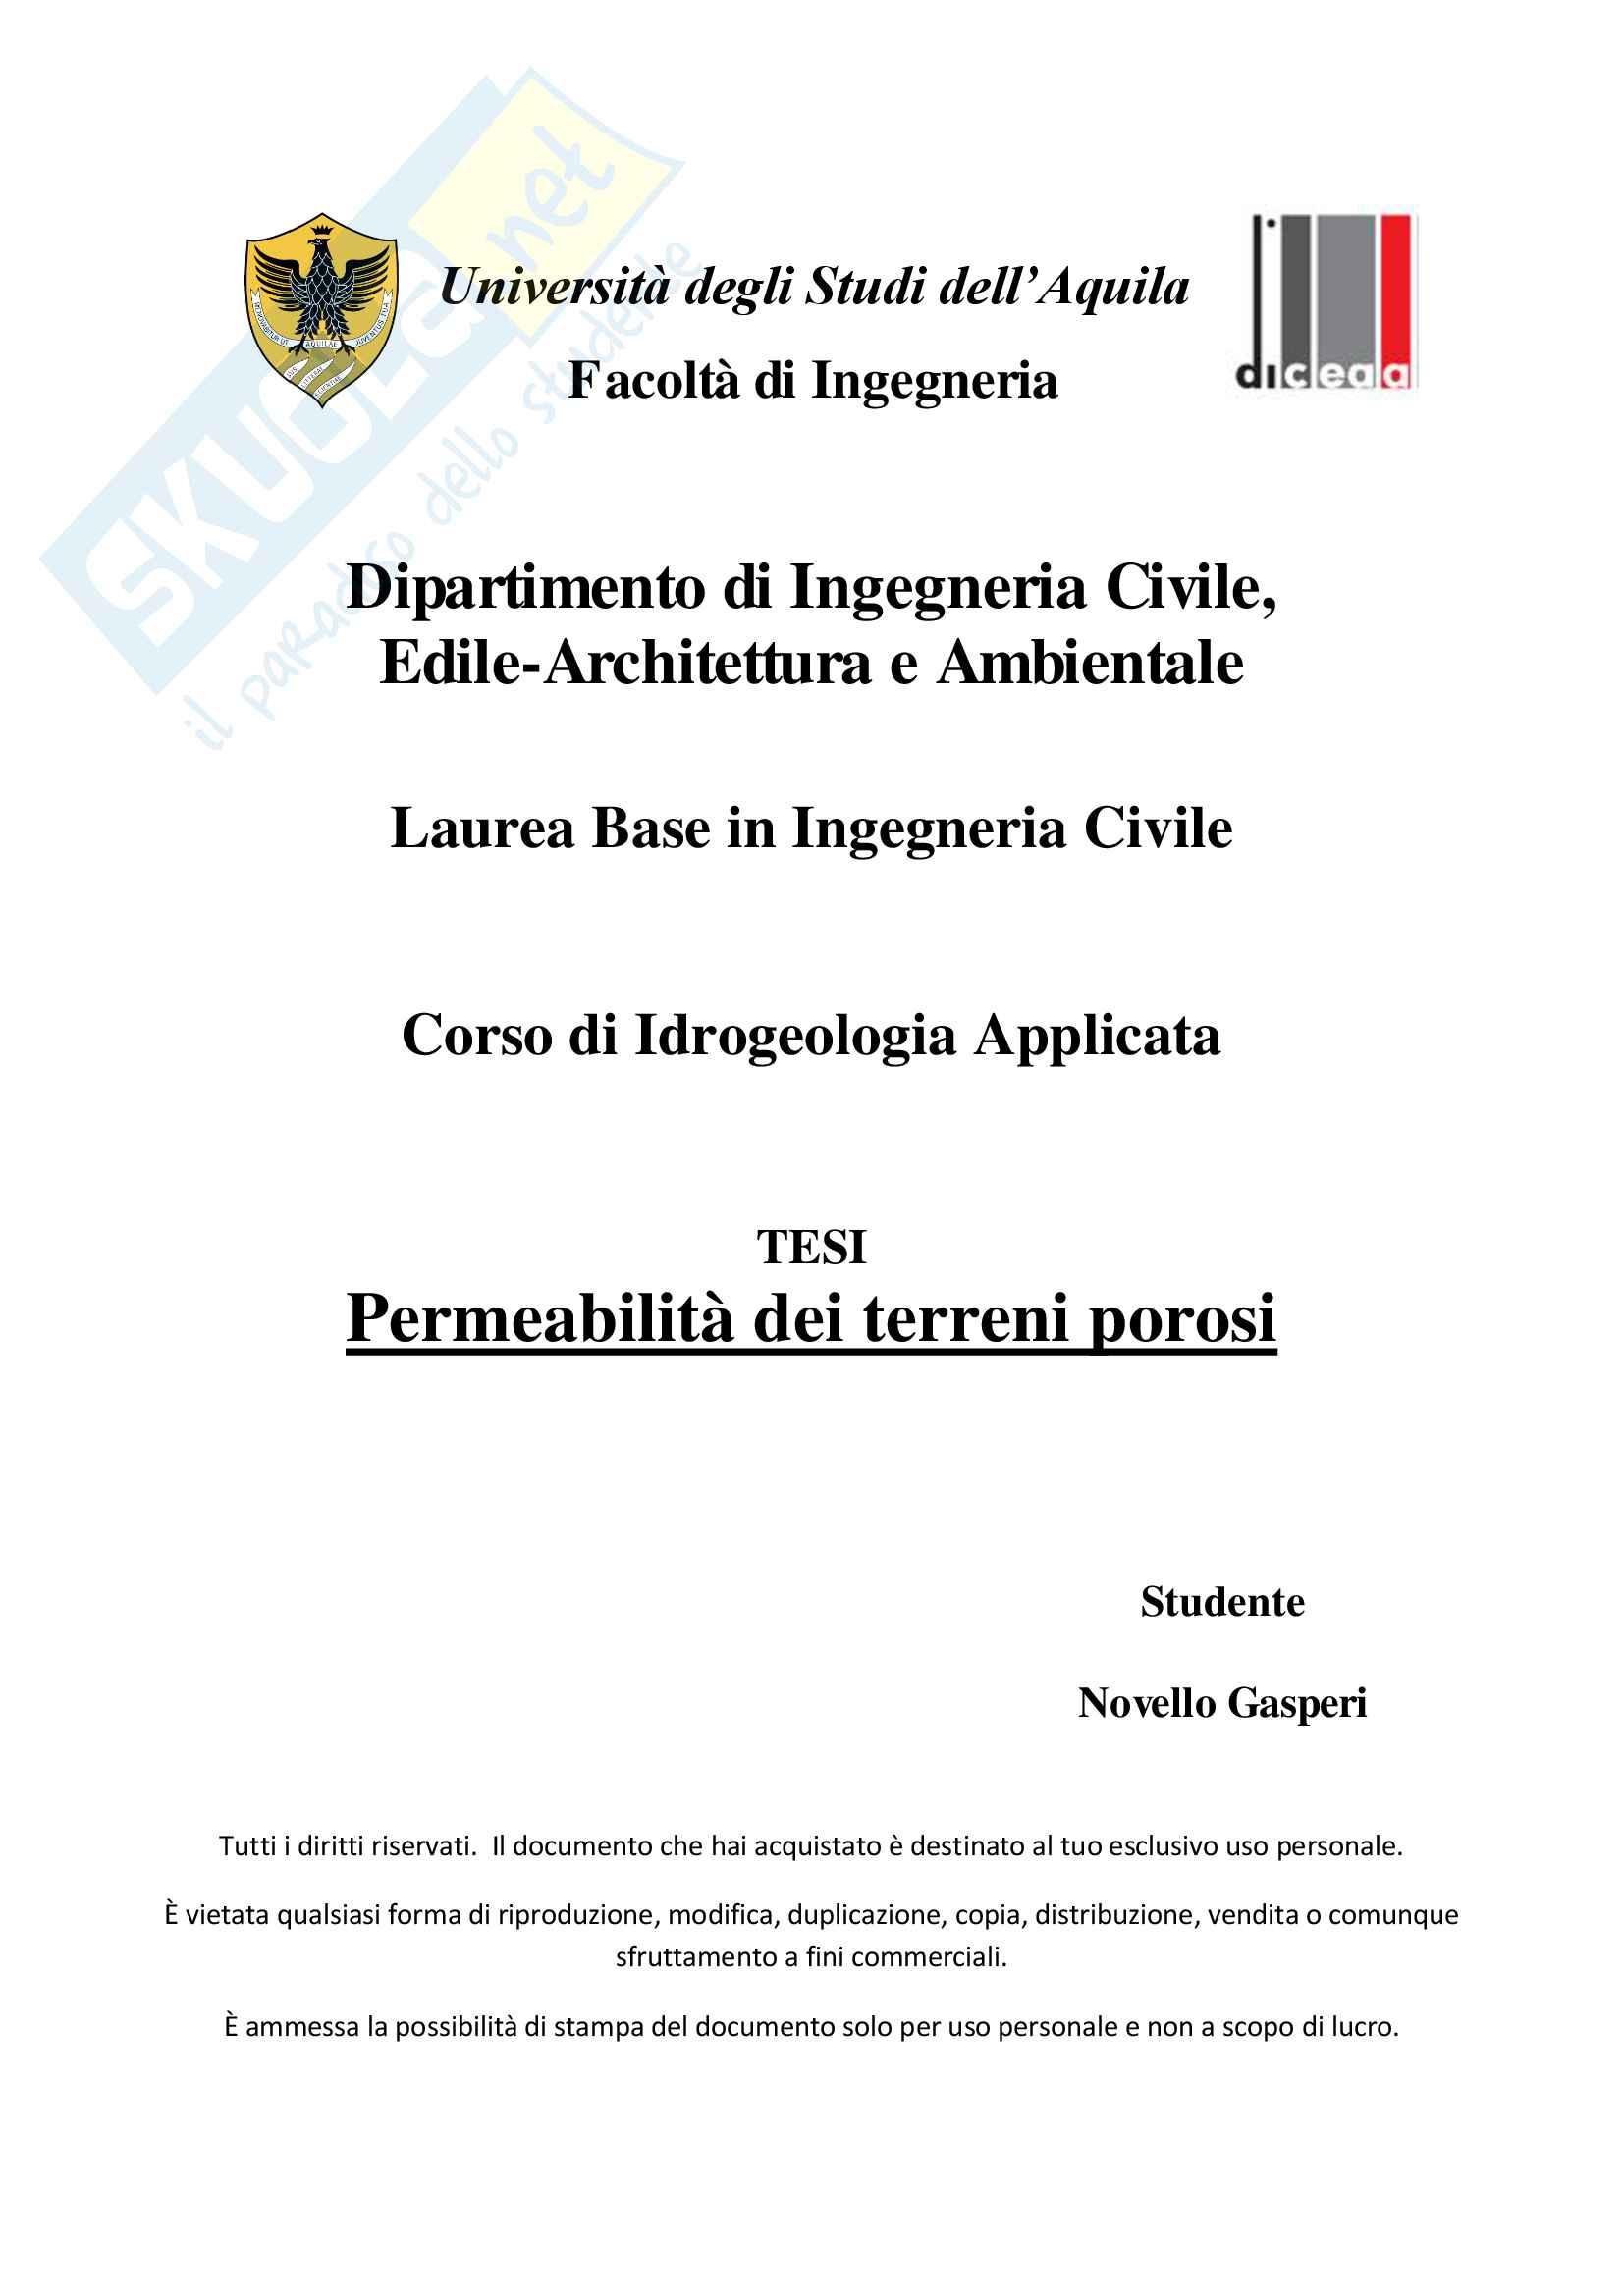 Permeabilità dei terreni porosi (pdf)